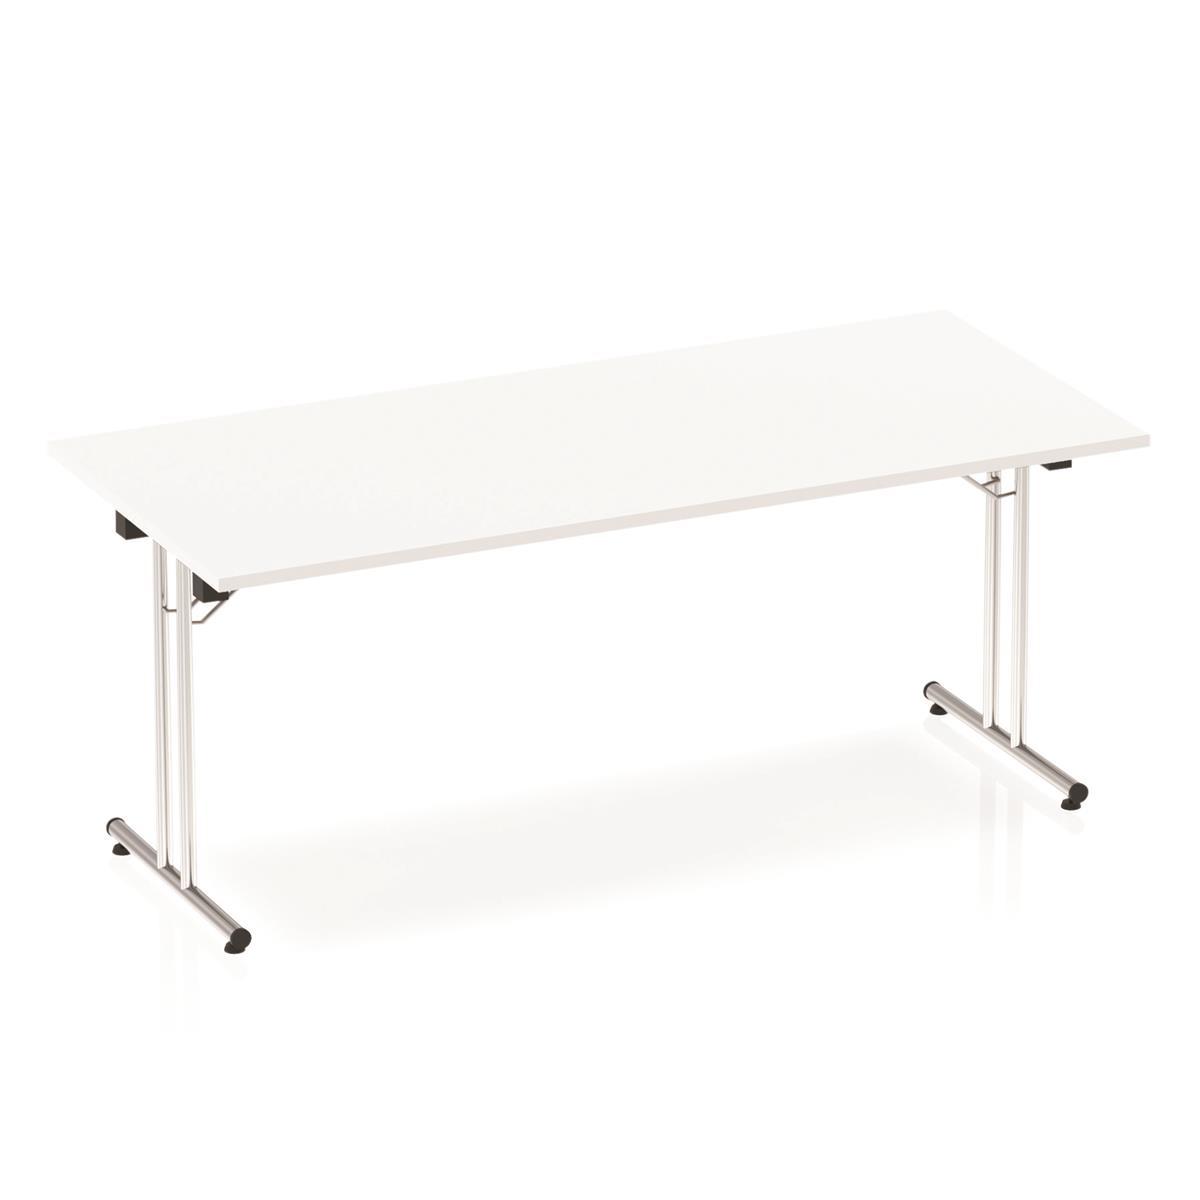 Sonix Rectangular Chrome Leg Folding Meeting Table 1800x800mm White Ref I000710